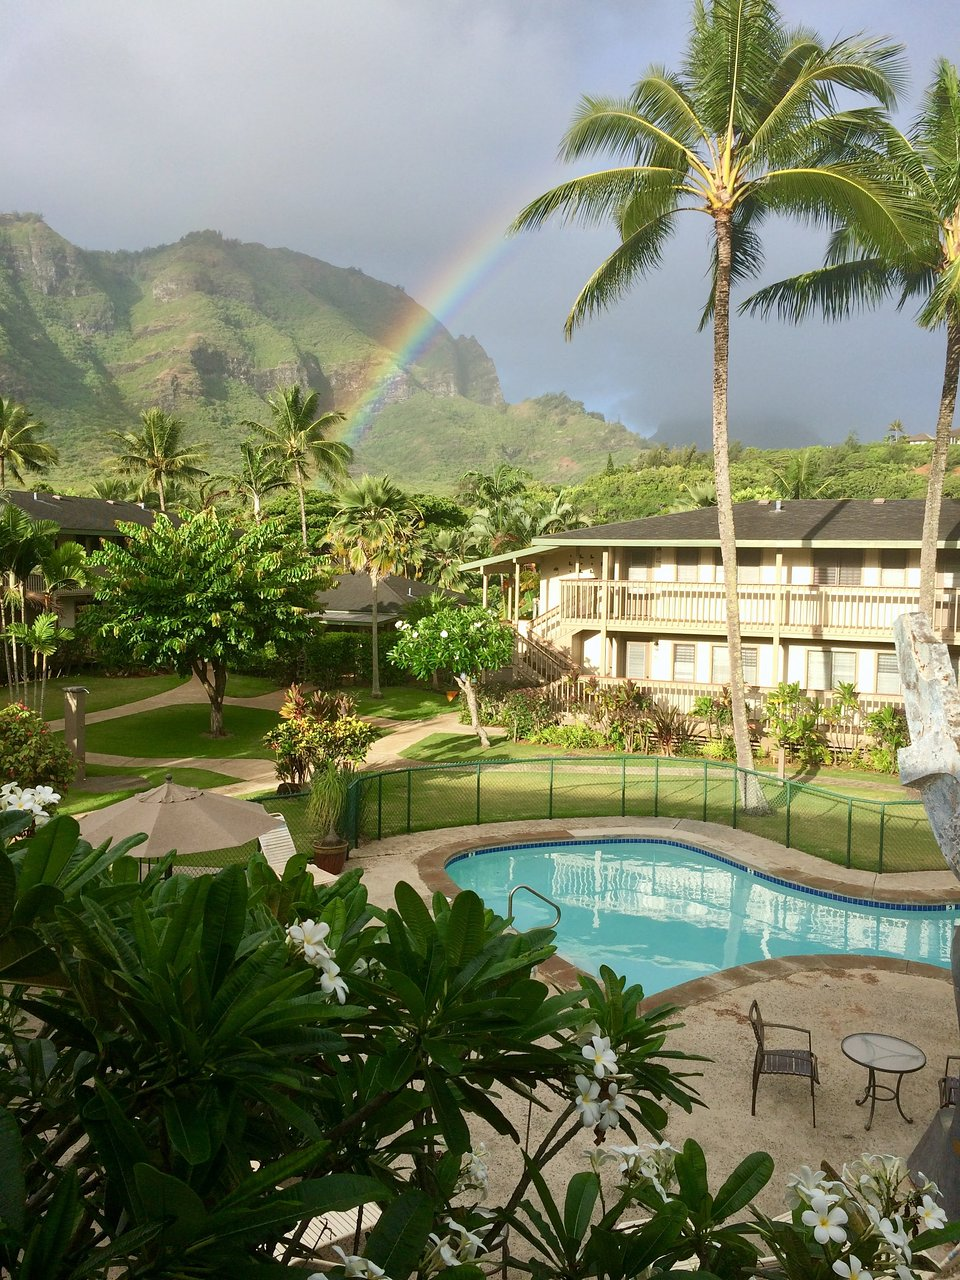 The Kauai Inn 148 1 7 6 Updated 2018 Prices Hotel Reviews Hi Tripadvisor